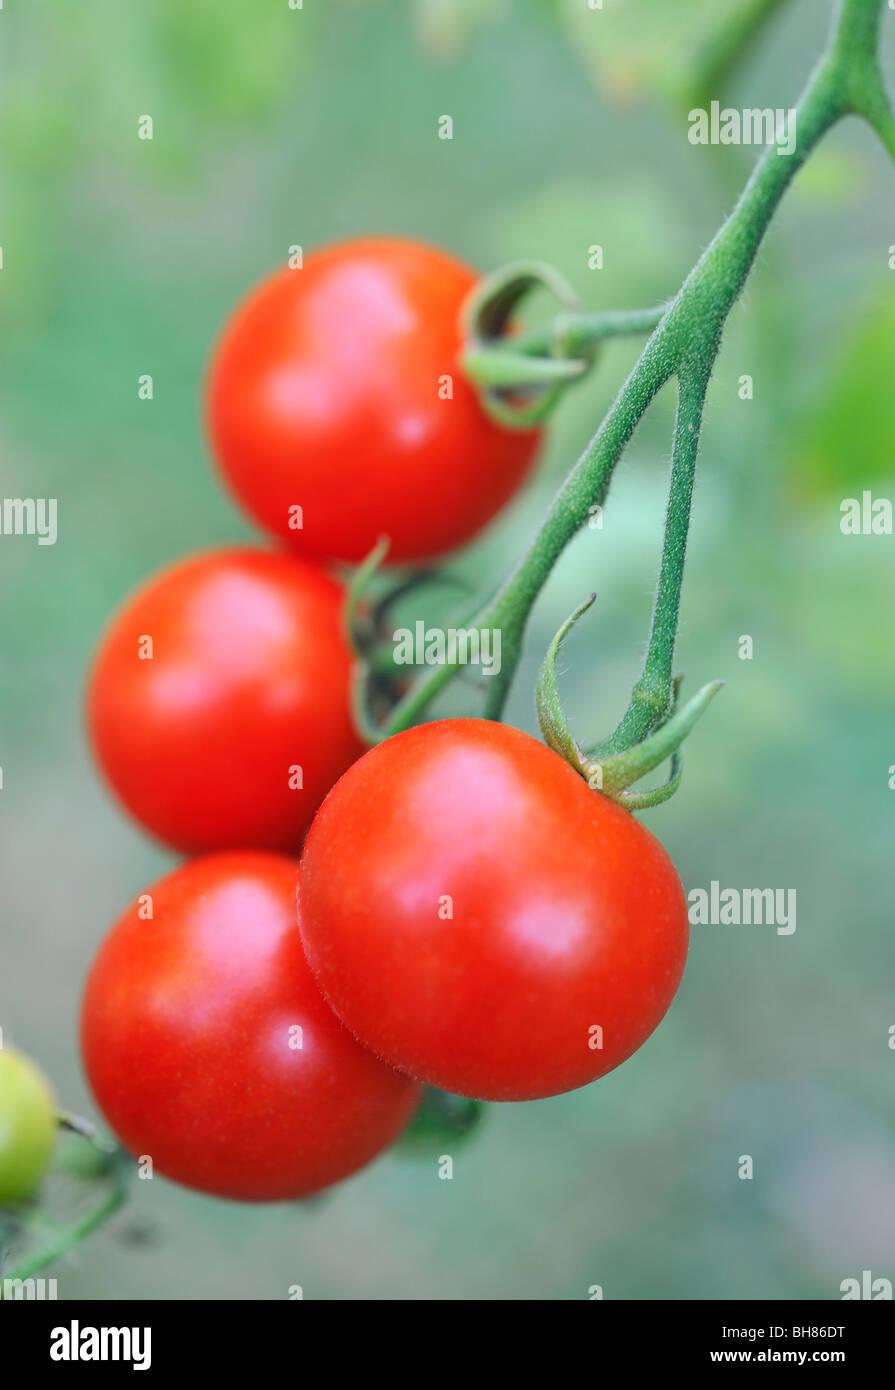 Tomaten wachsen auf Rebe Stockbild